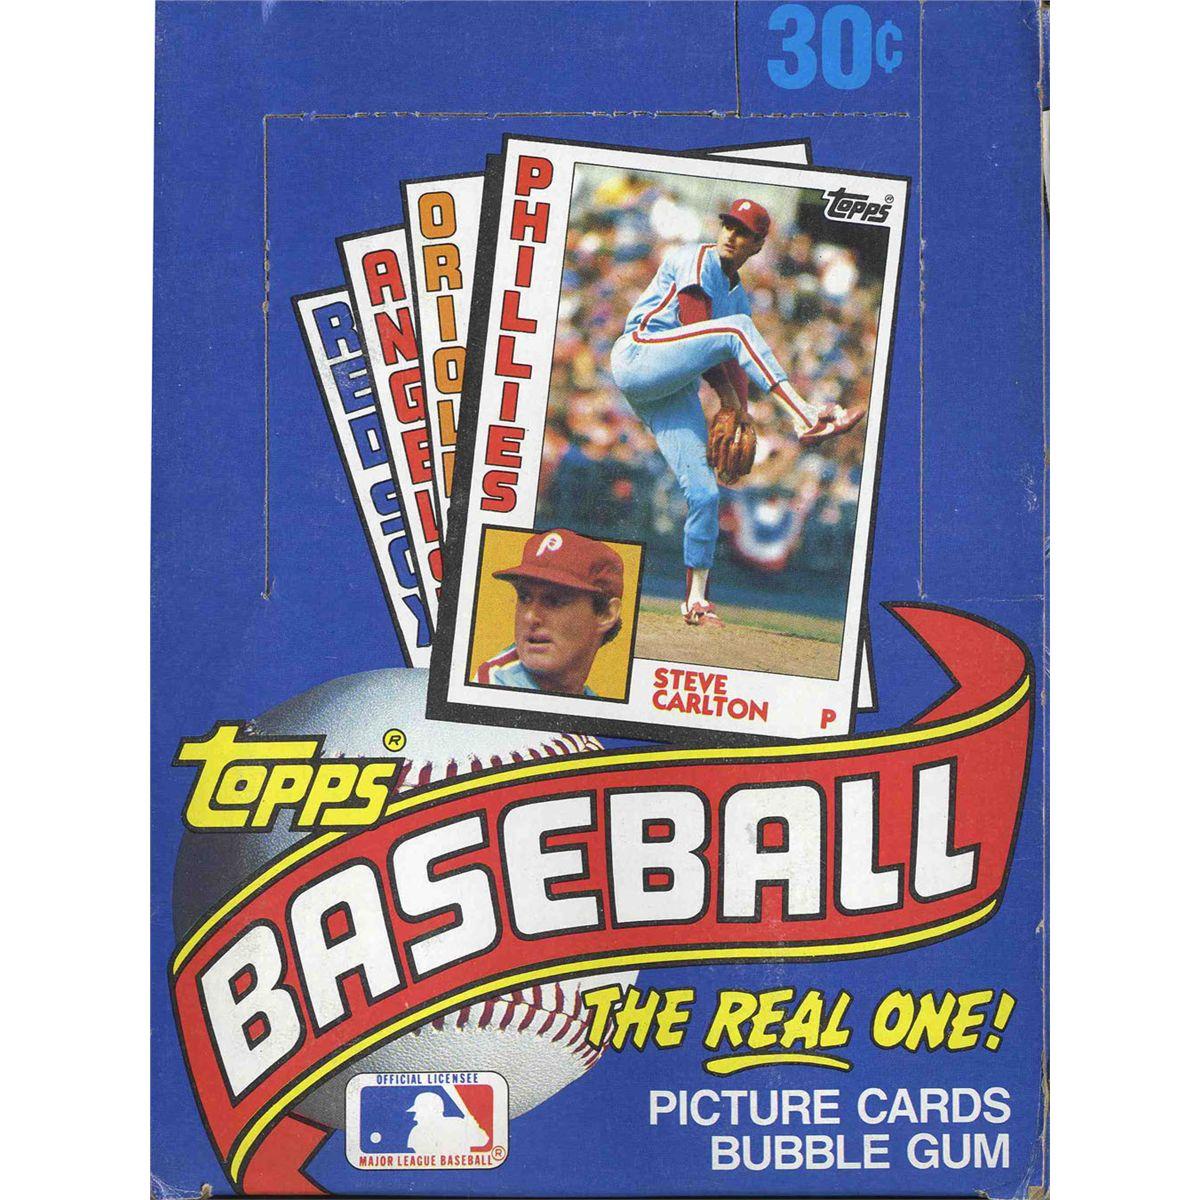 1984 Topps Baseball Cards Box